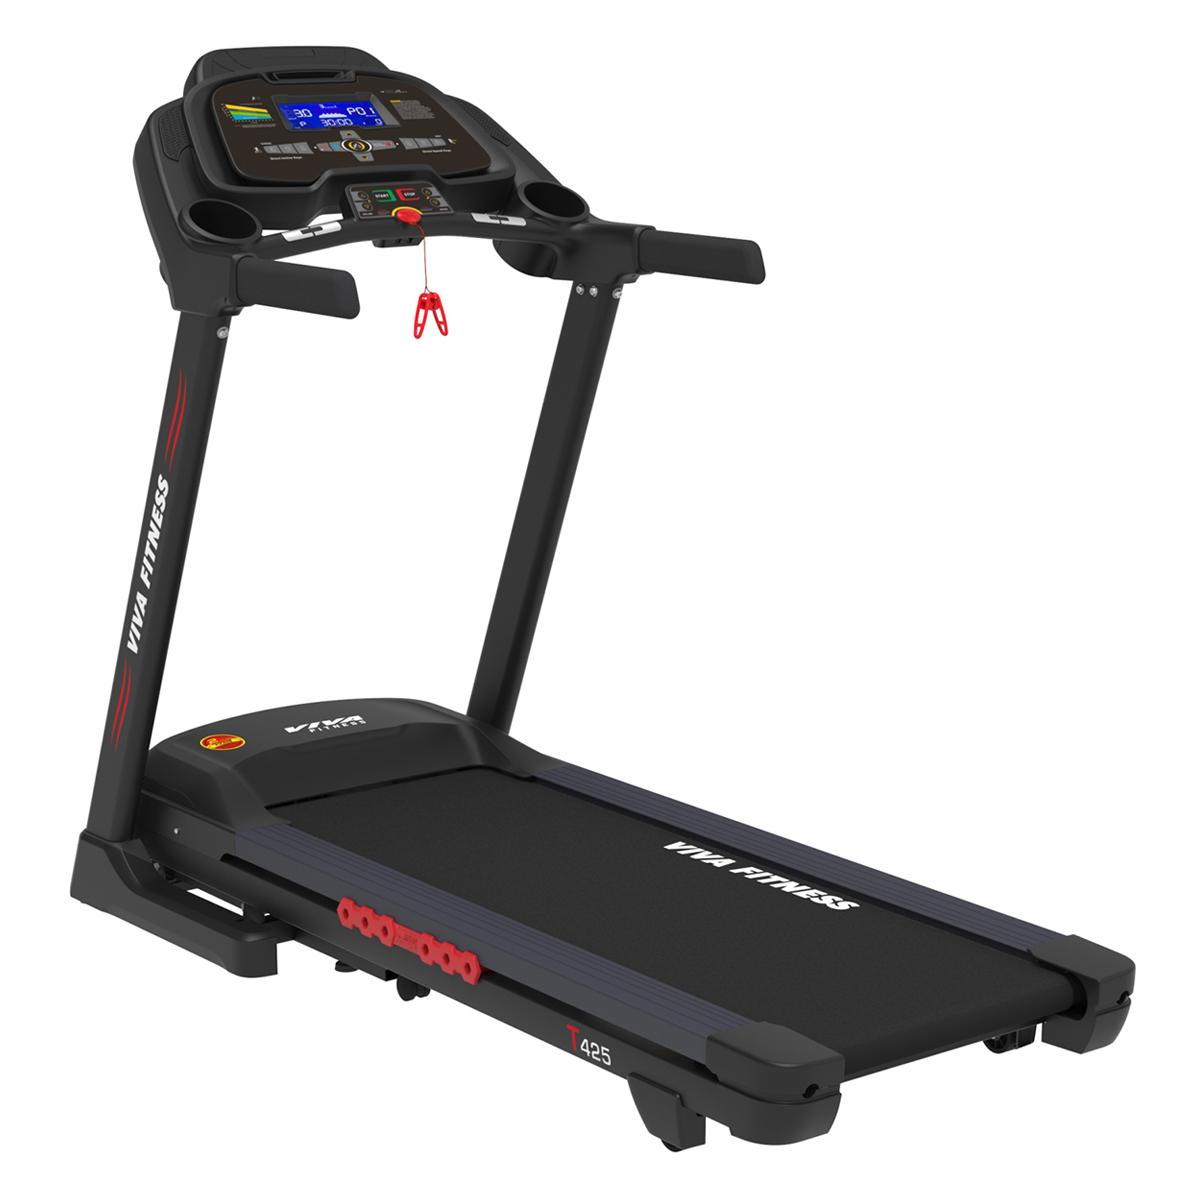 T-425 Motorized Treadmill